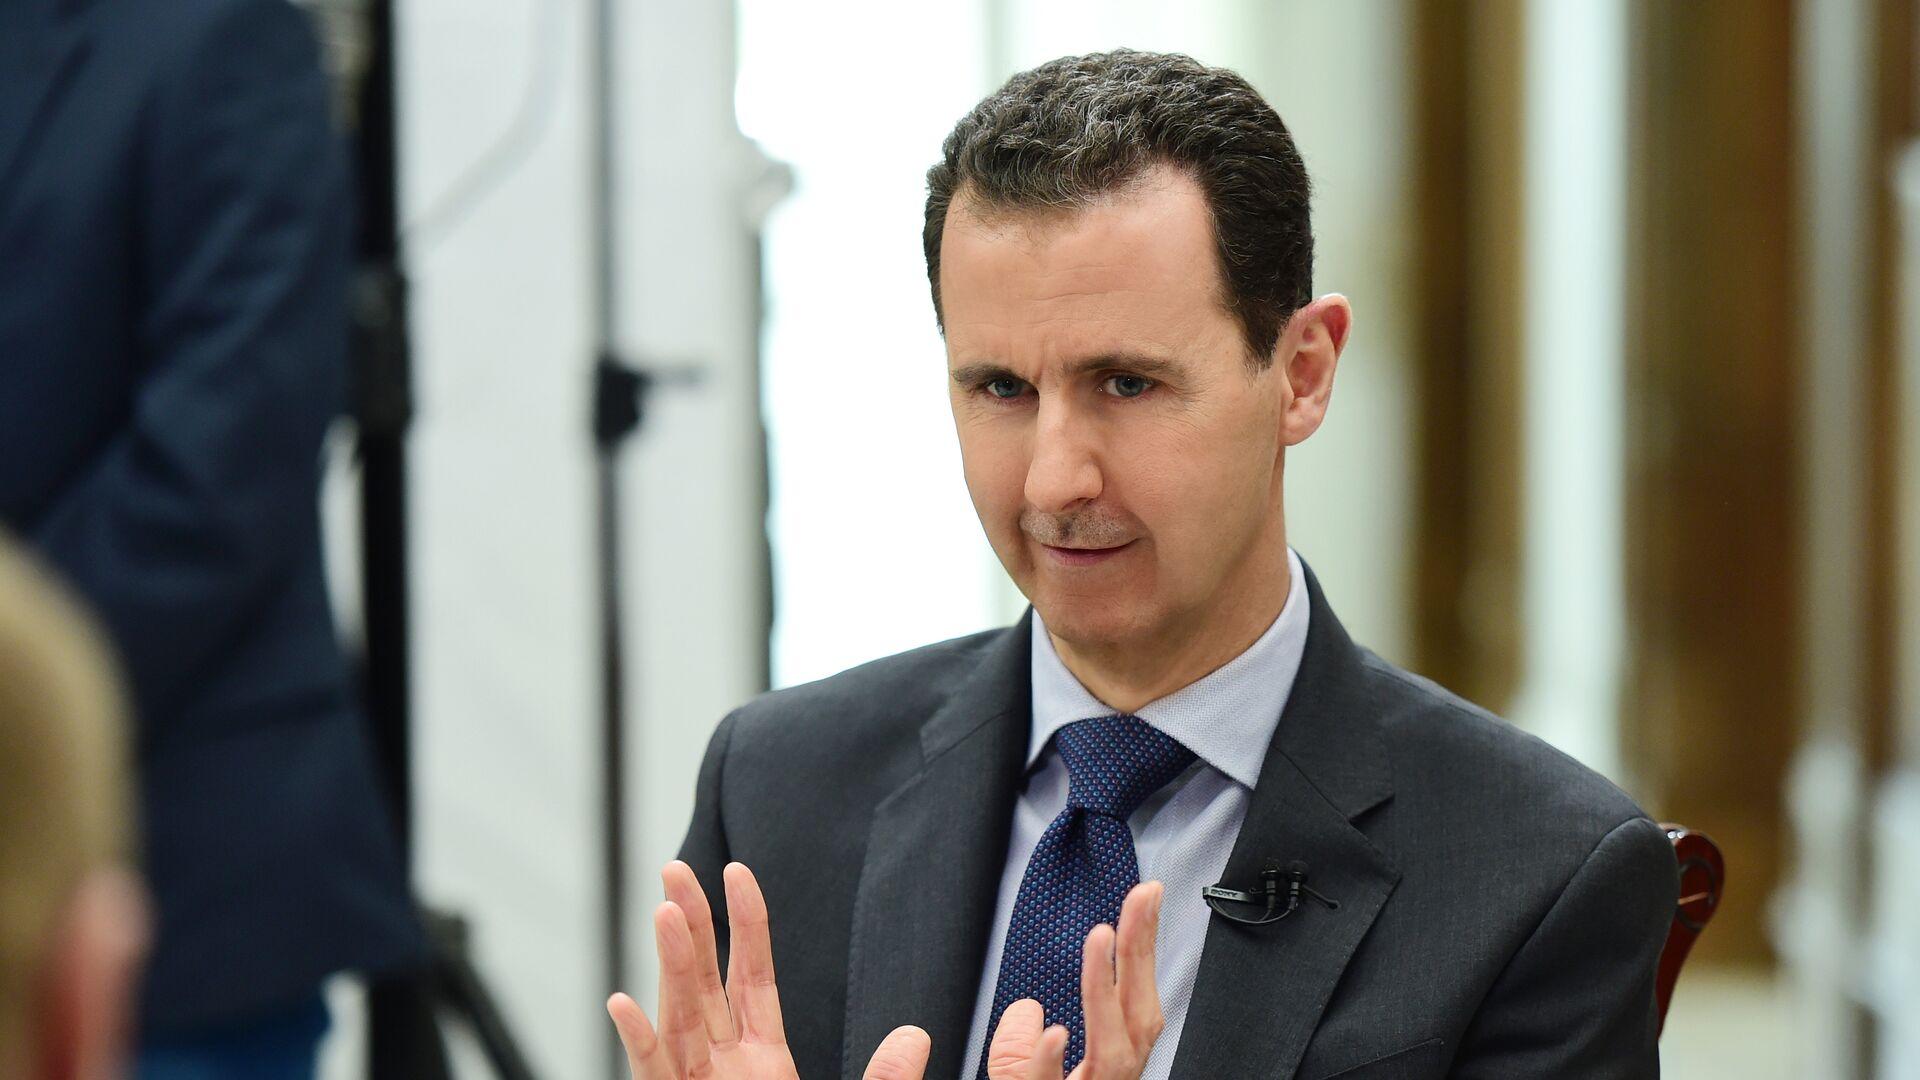 Il presidente siriano Bashar al-Assad - Sputnik Italia, 1920, 03.06.2021